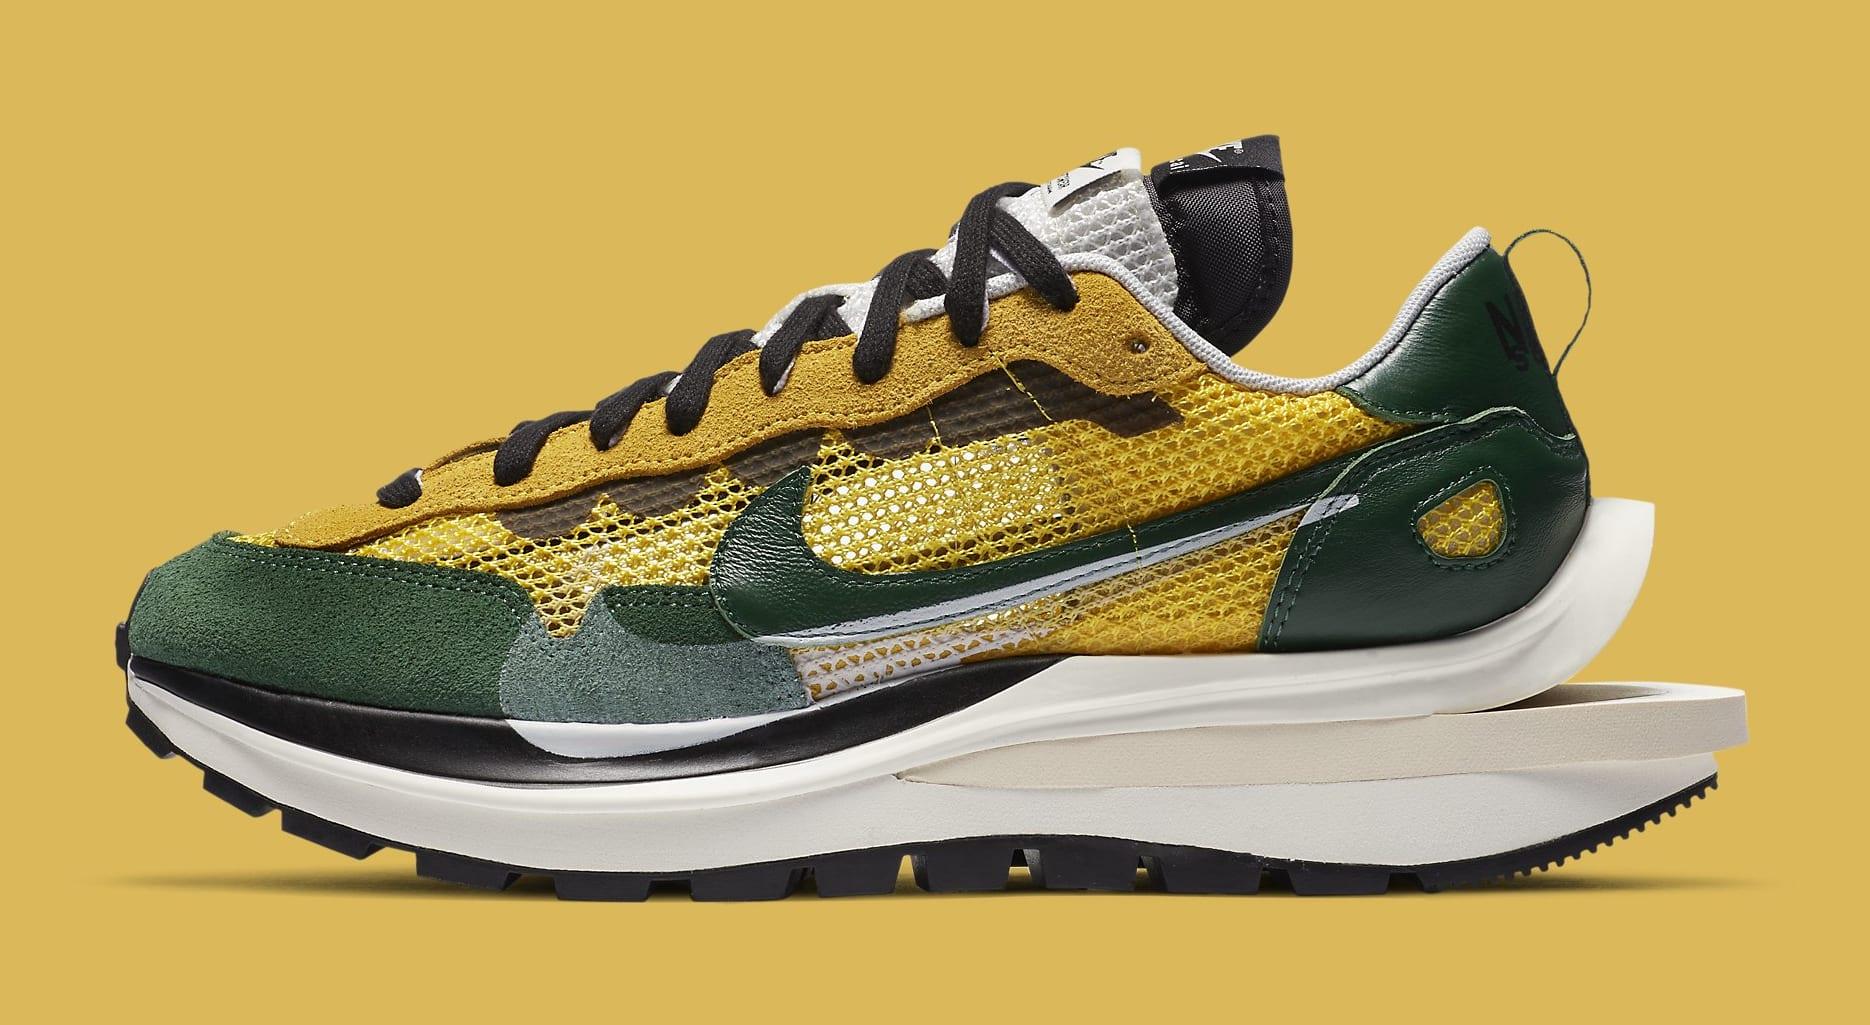 Sacai x Nike VaporWaffle 'Tour Yellow' CV1363-700 Lateral